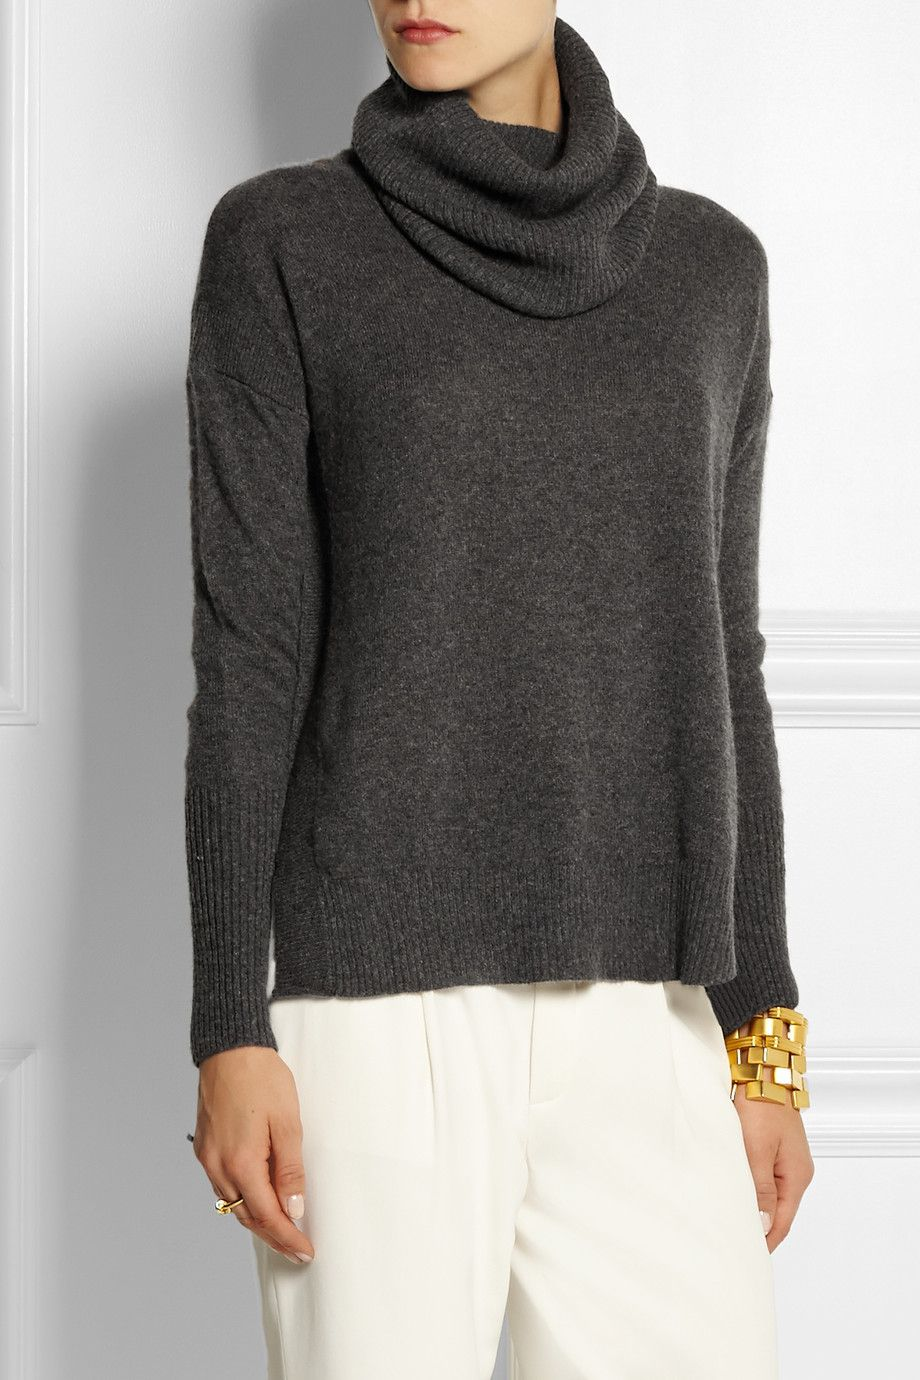 Charcoal Ahiga Slim cashmere turtleneck sweater | Diane von